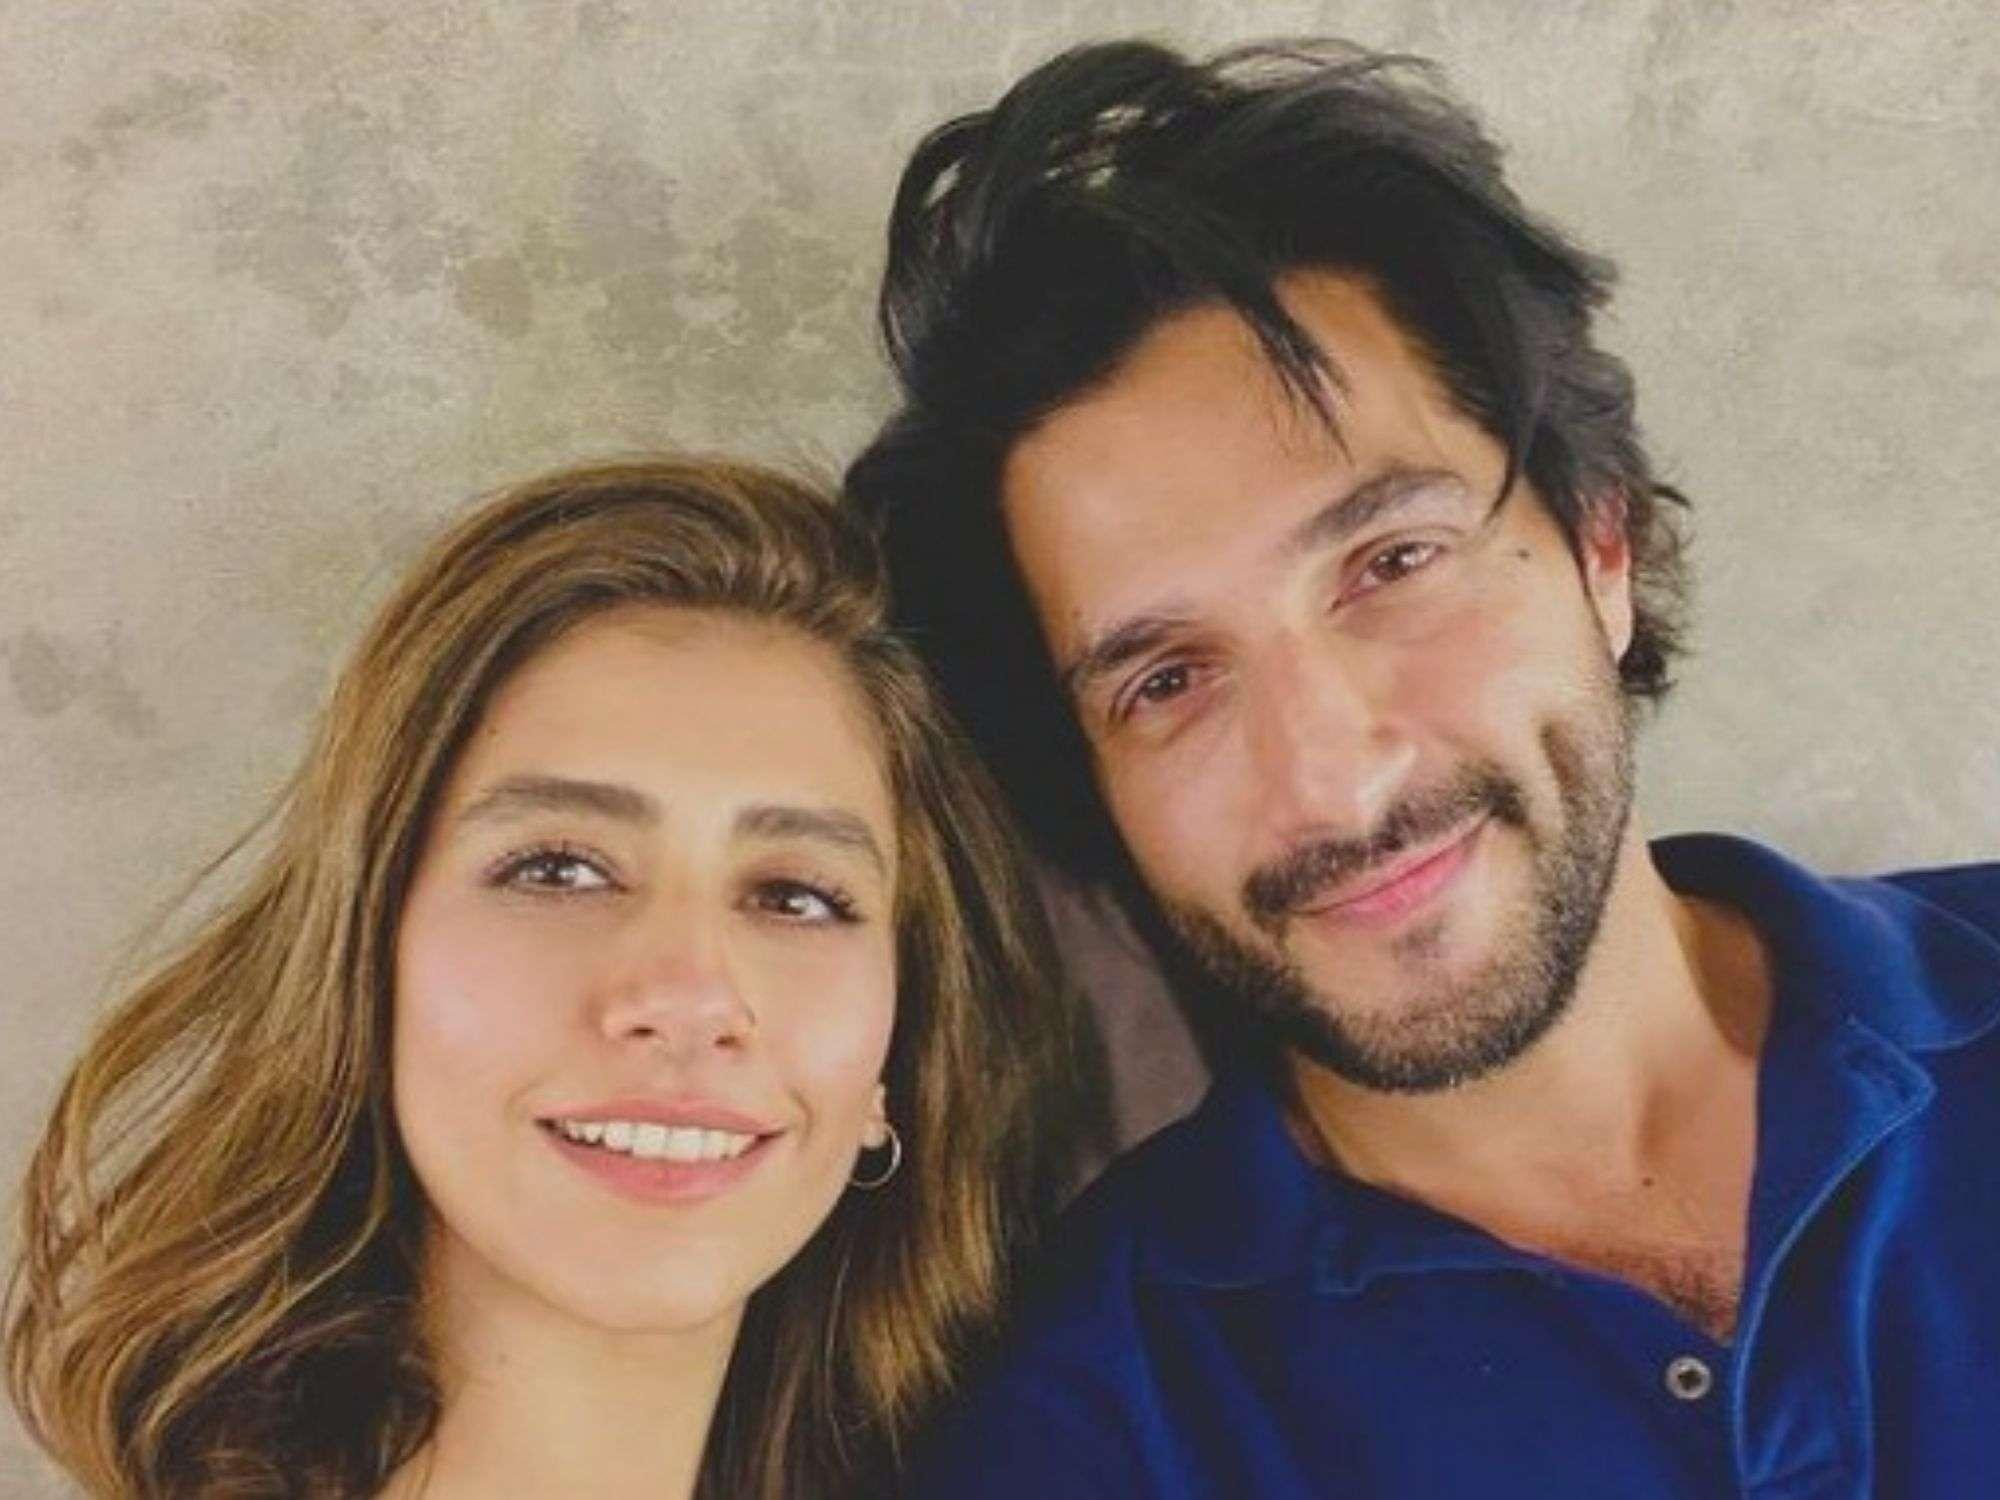 Syra Yousuf dating Bilal Ashraf? Find out